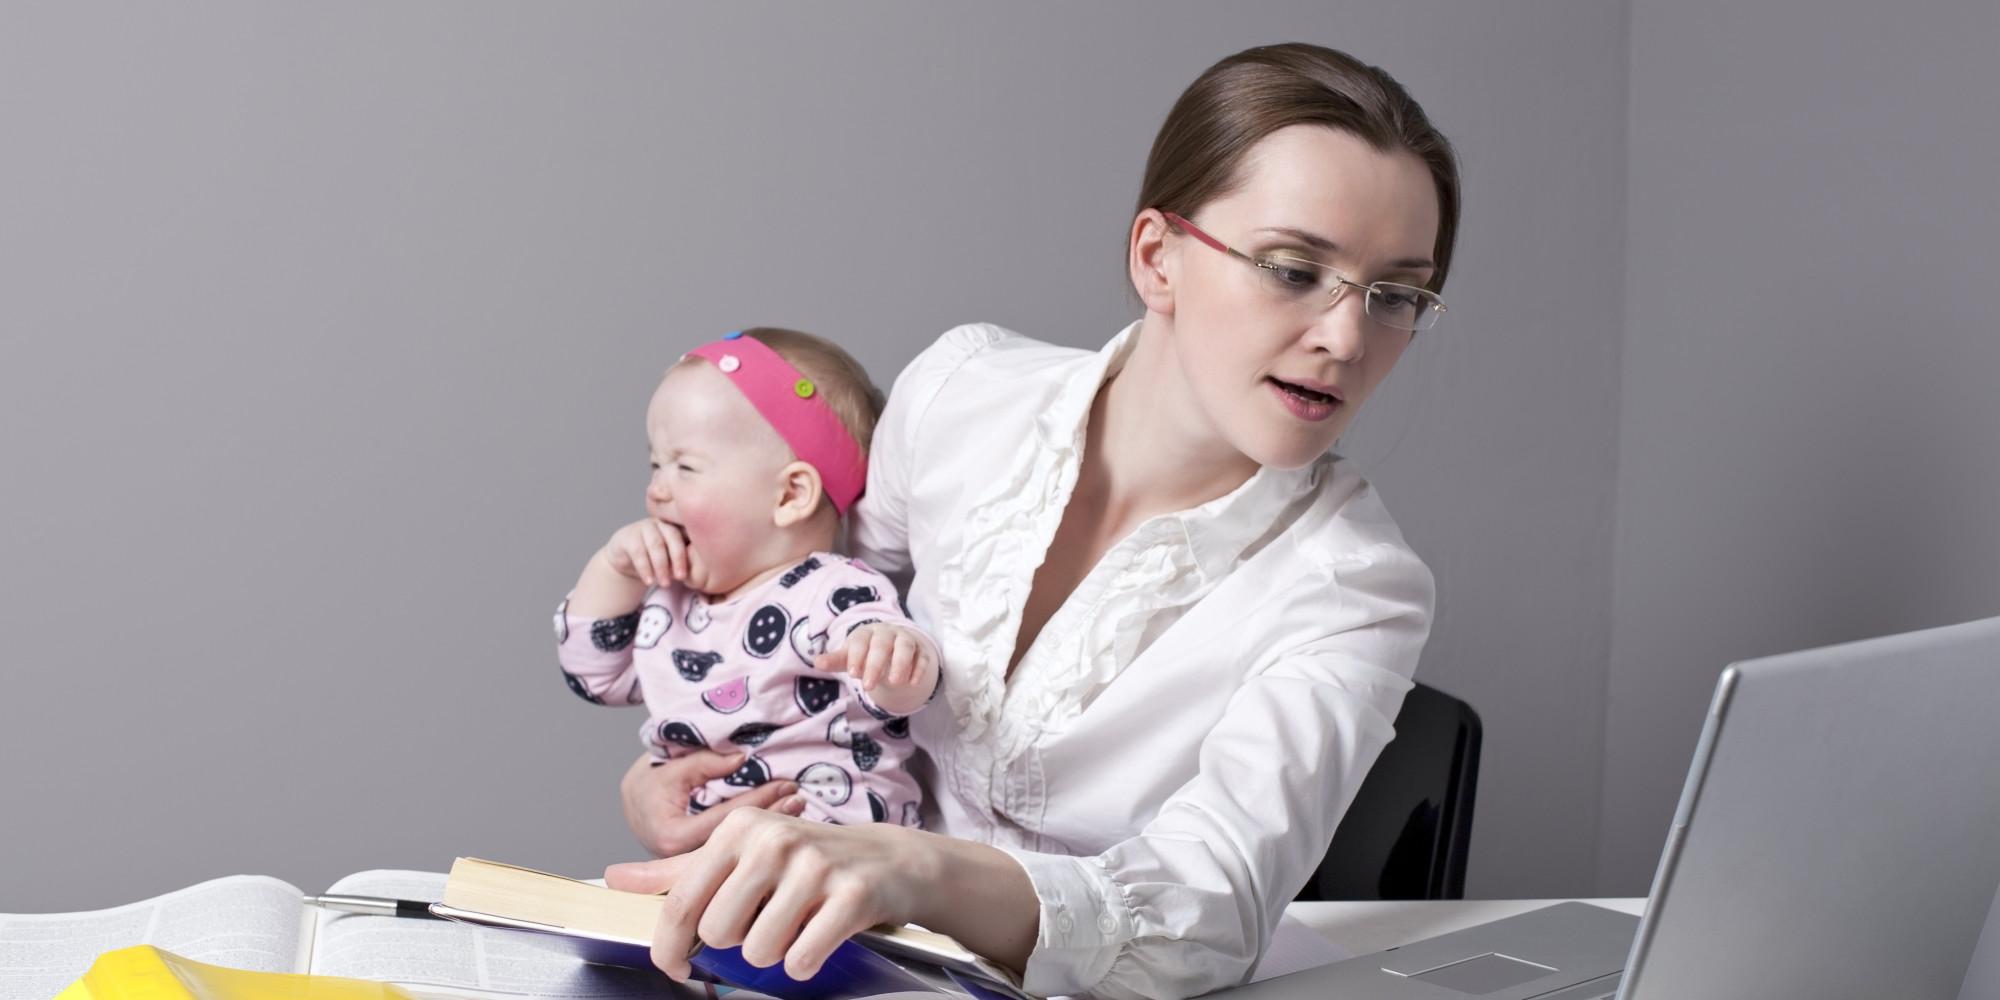 parent working parents dilemma happy workaholic things lists re come should